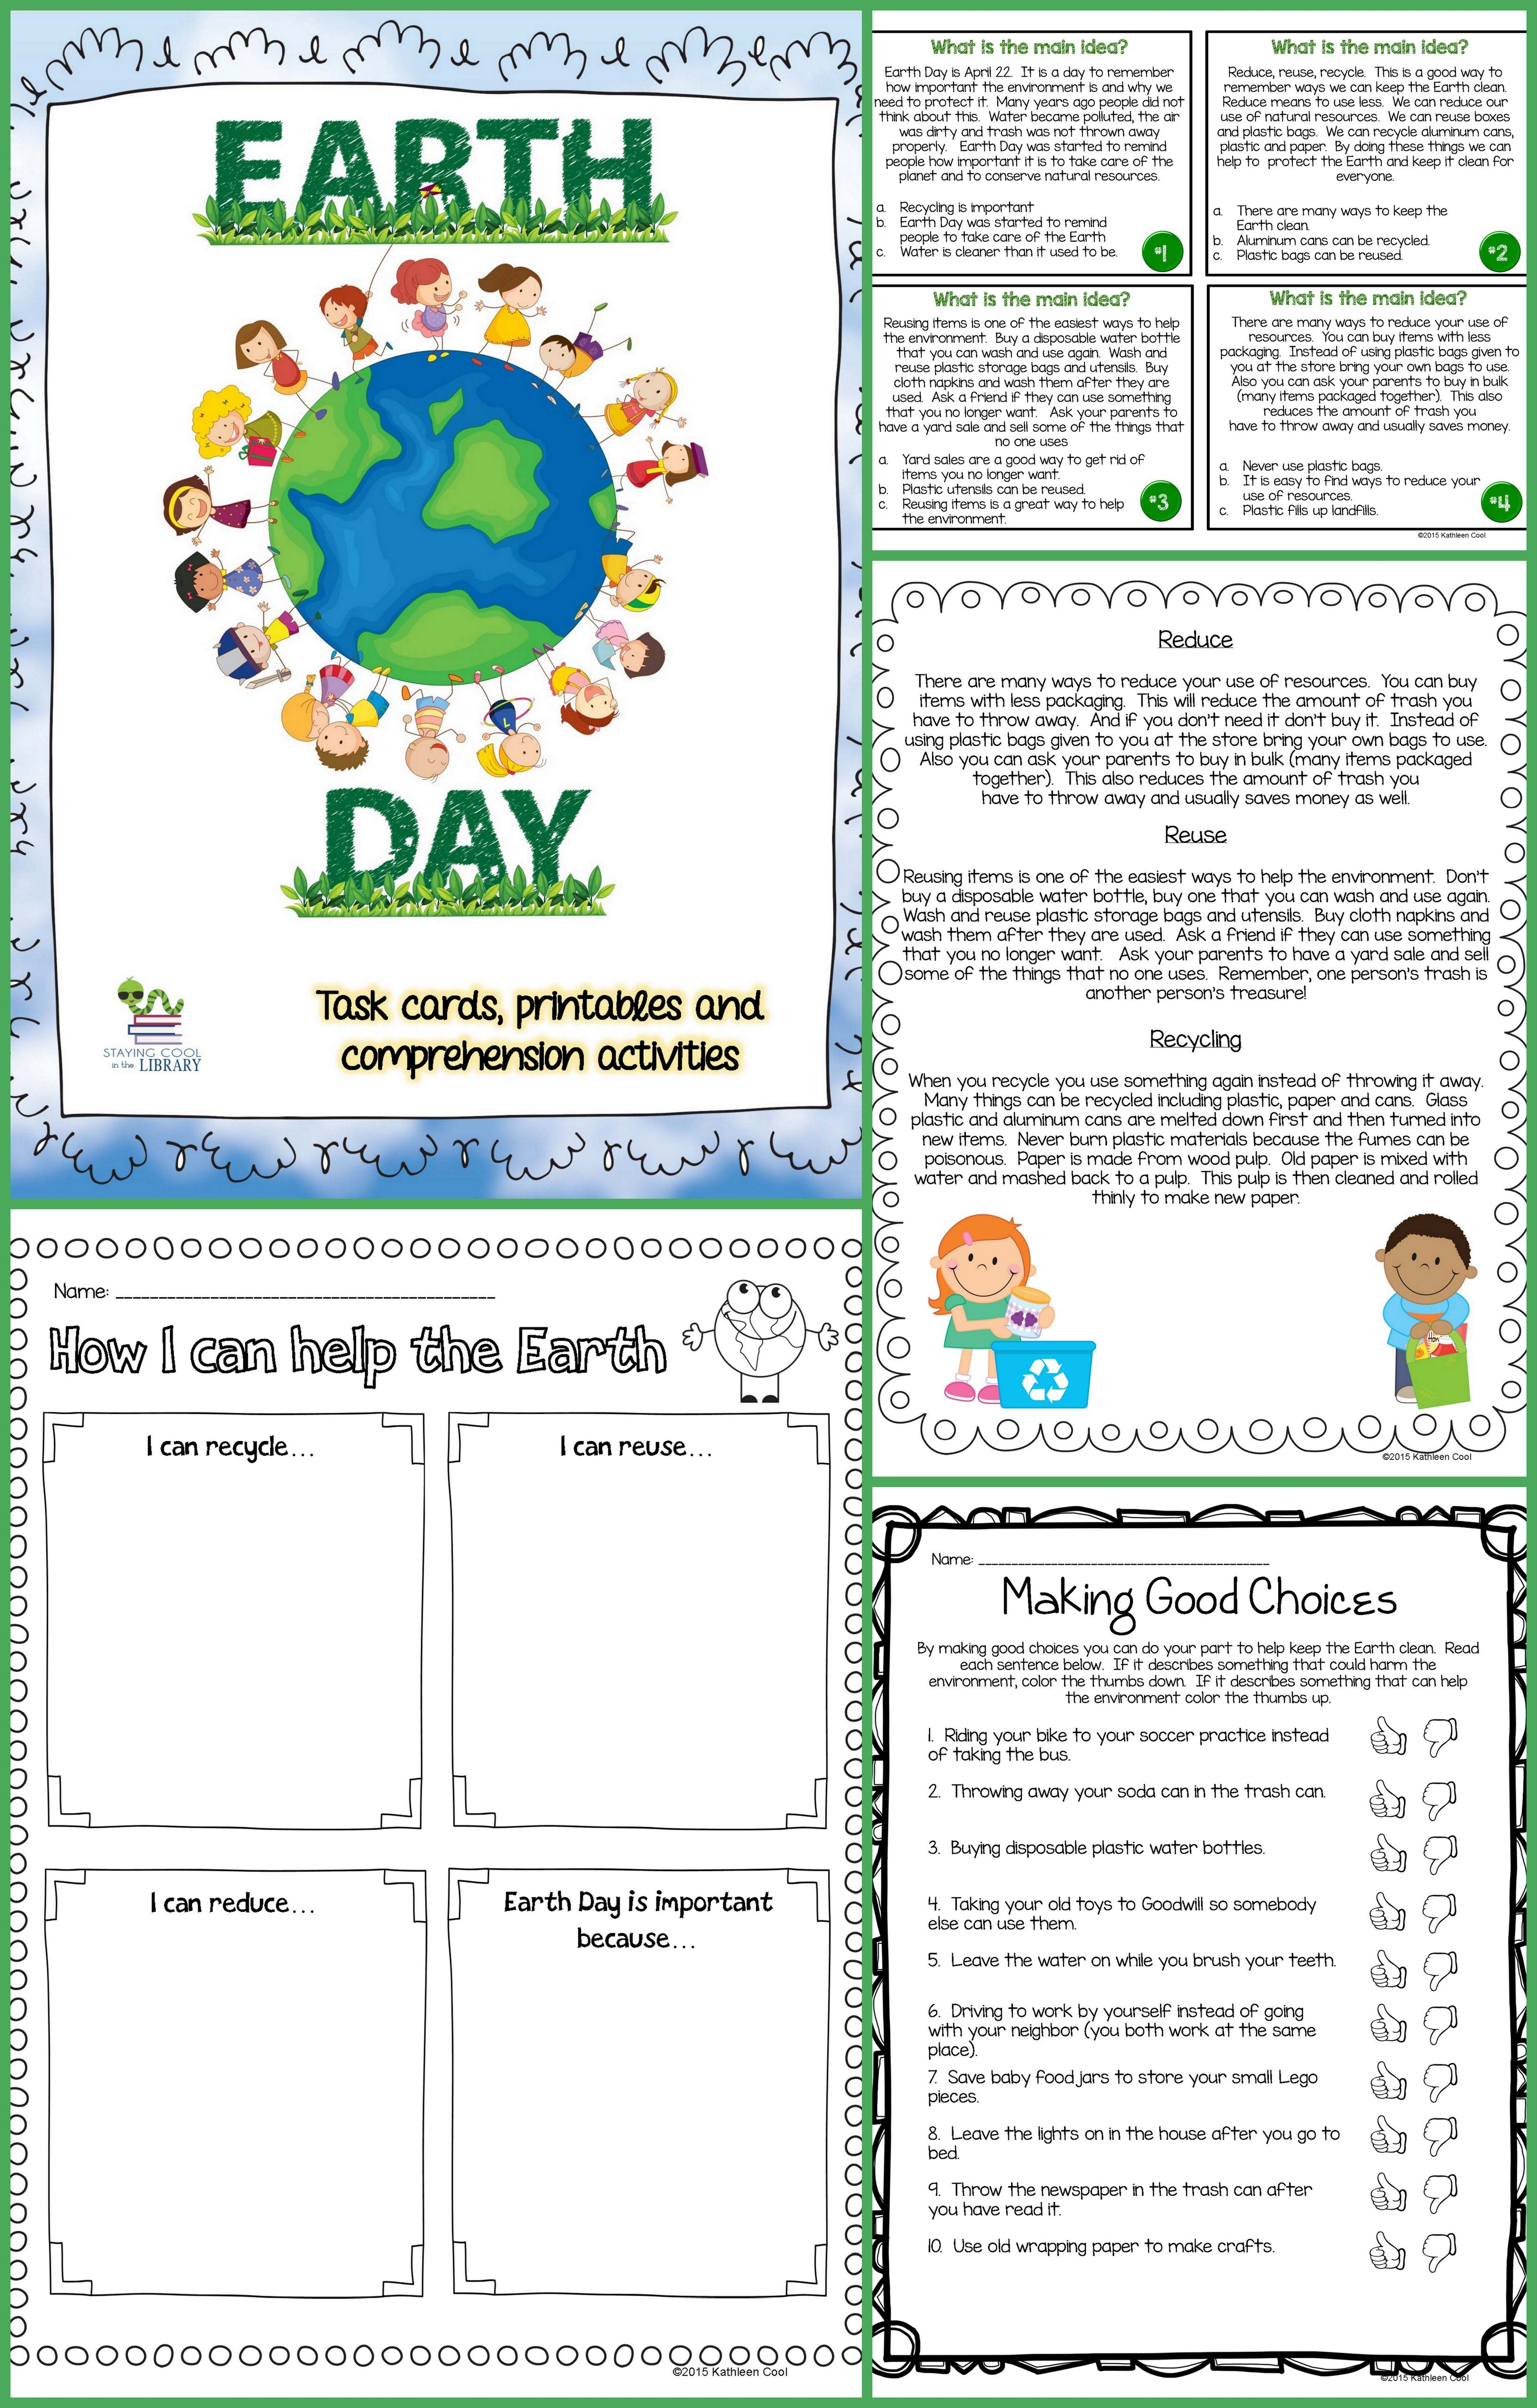 earth day activities earth day activities earth day earth day information. Black Bedroom Furniture Sets. Home Design Ideas